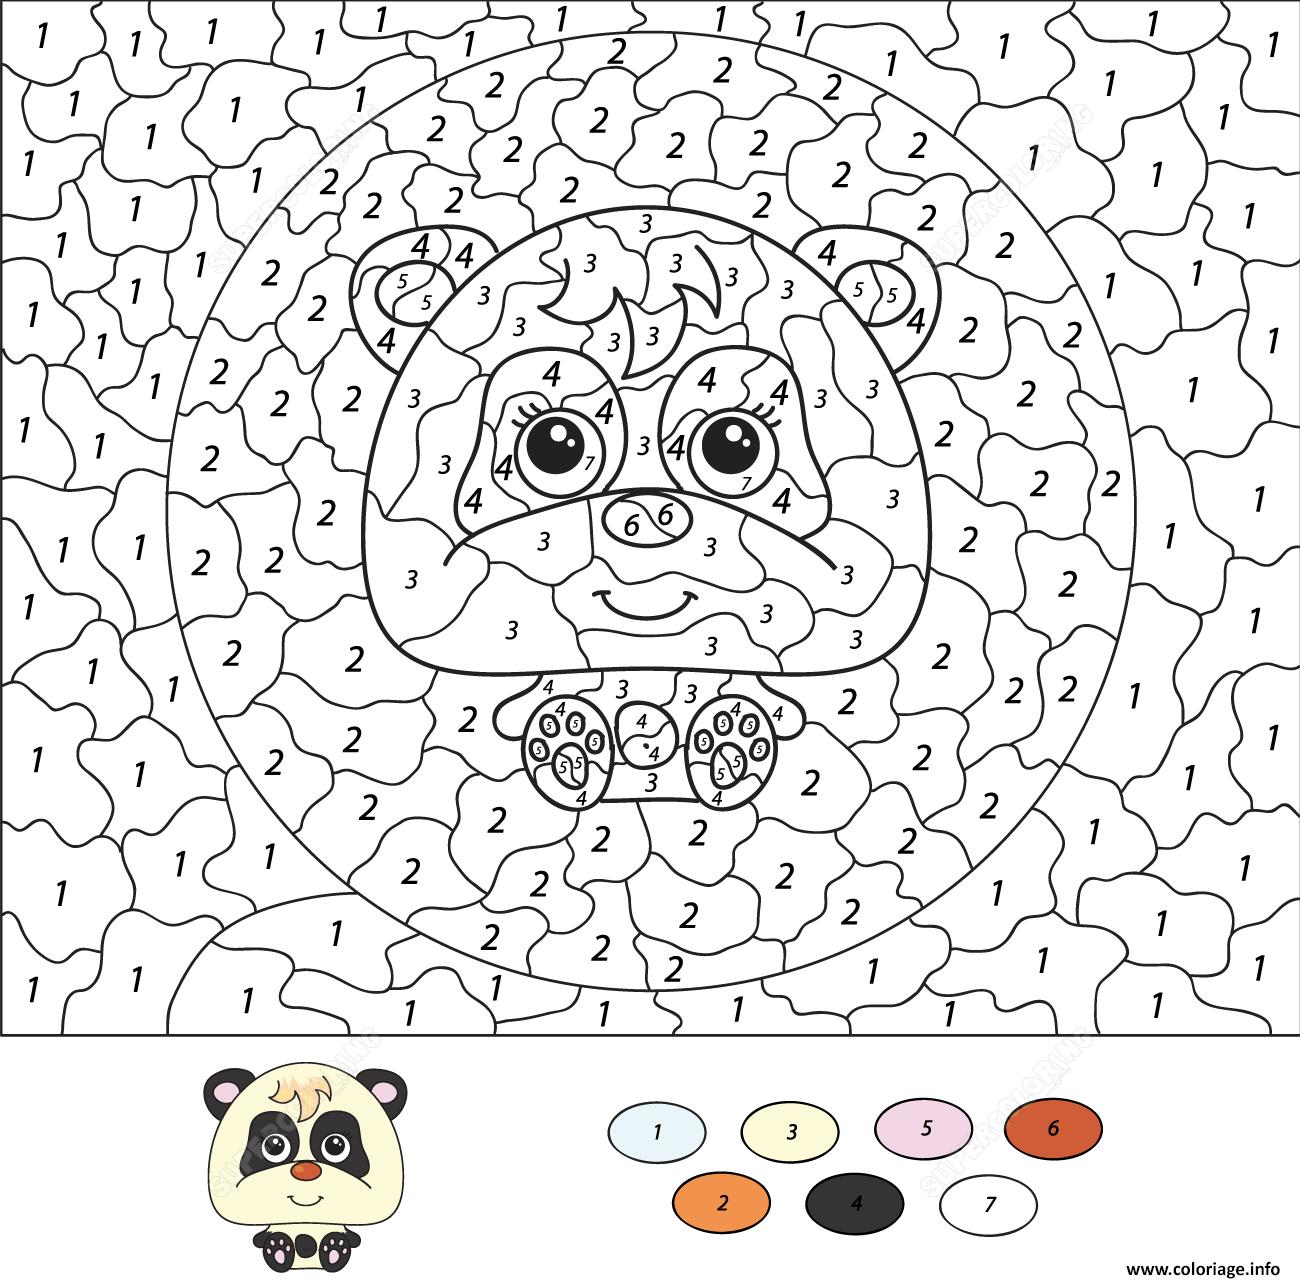 Coloriage Magique CE332 Cartoon Panda Dessin Magique CE332 à imprimer